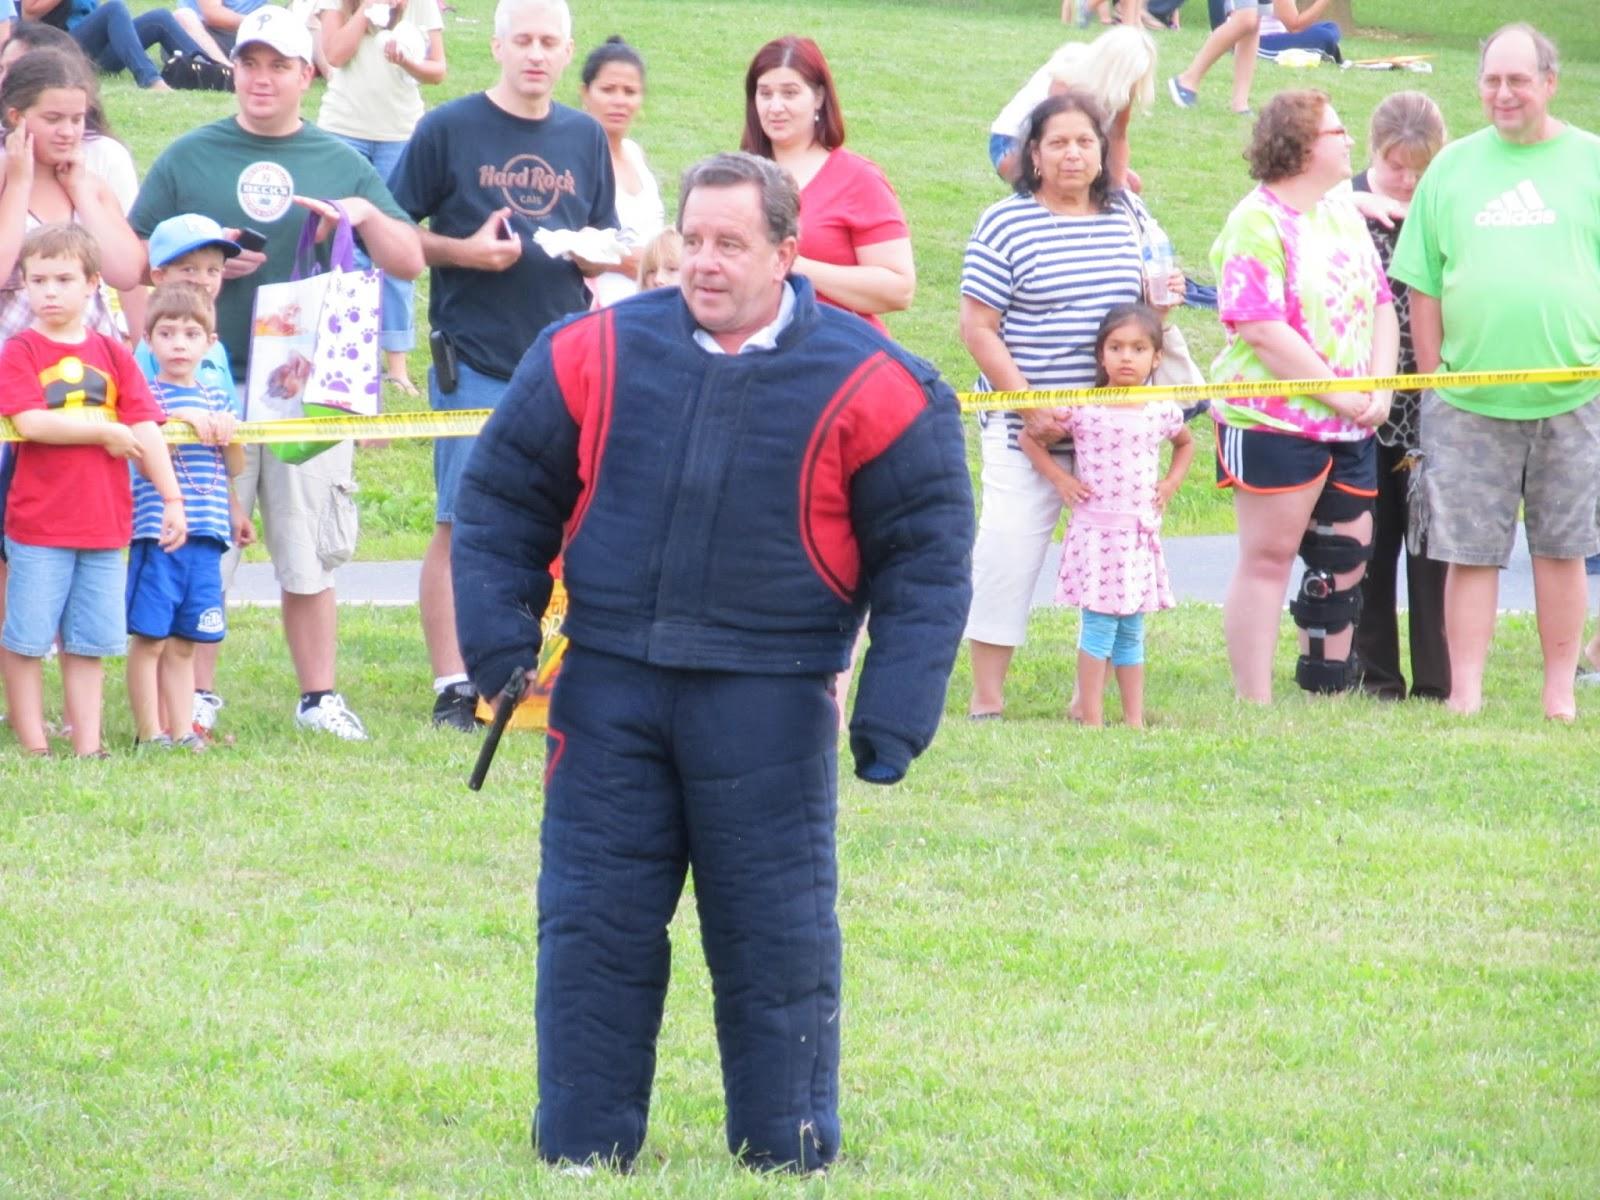 Lehigh valley ramblings: natl night out draws 500 in bethlehem township